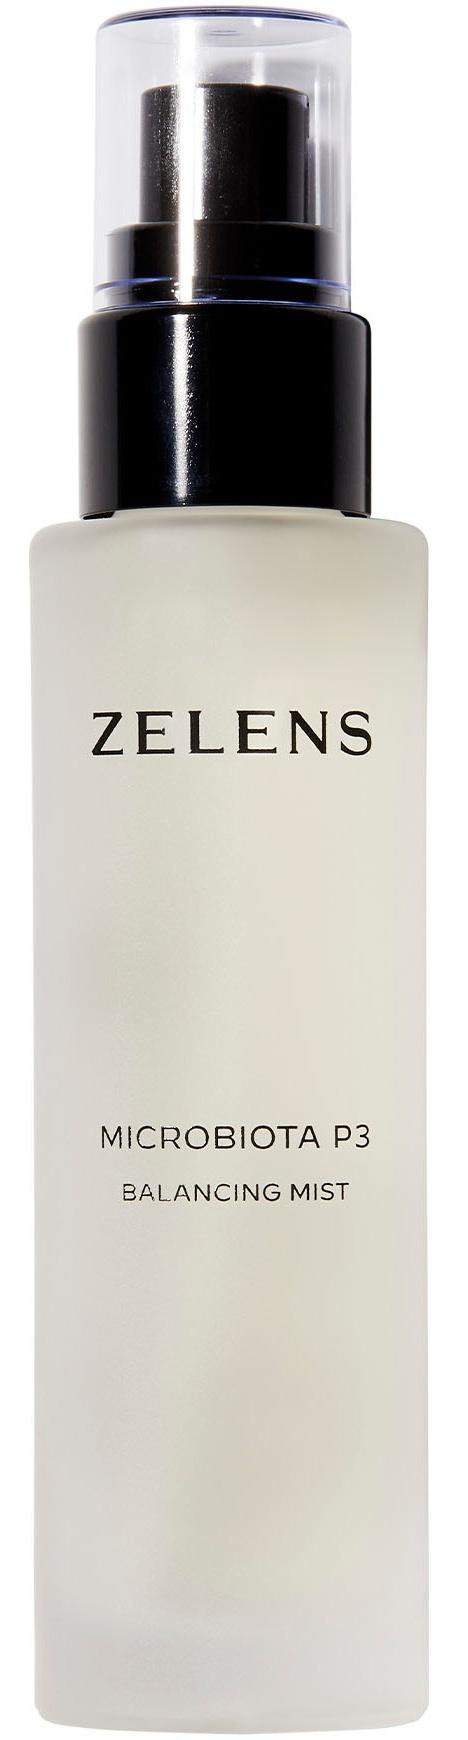 Zelens Microbiota P3 Balancing Mist